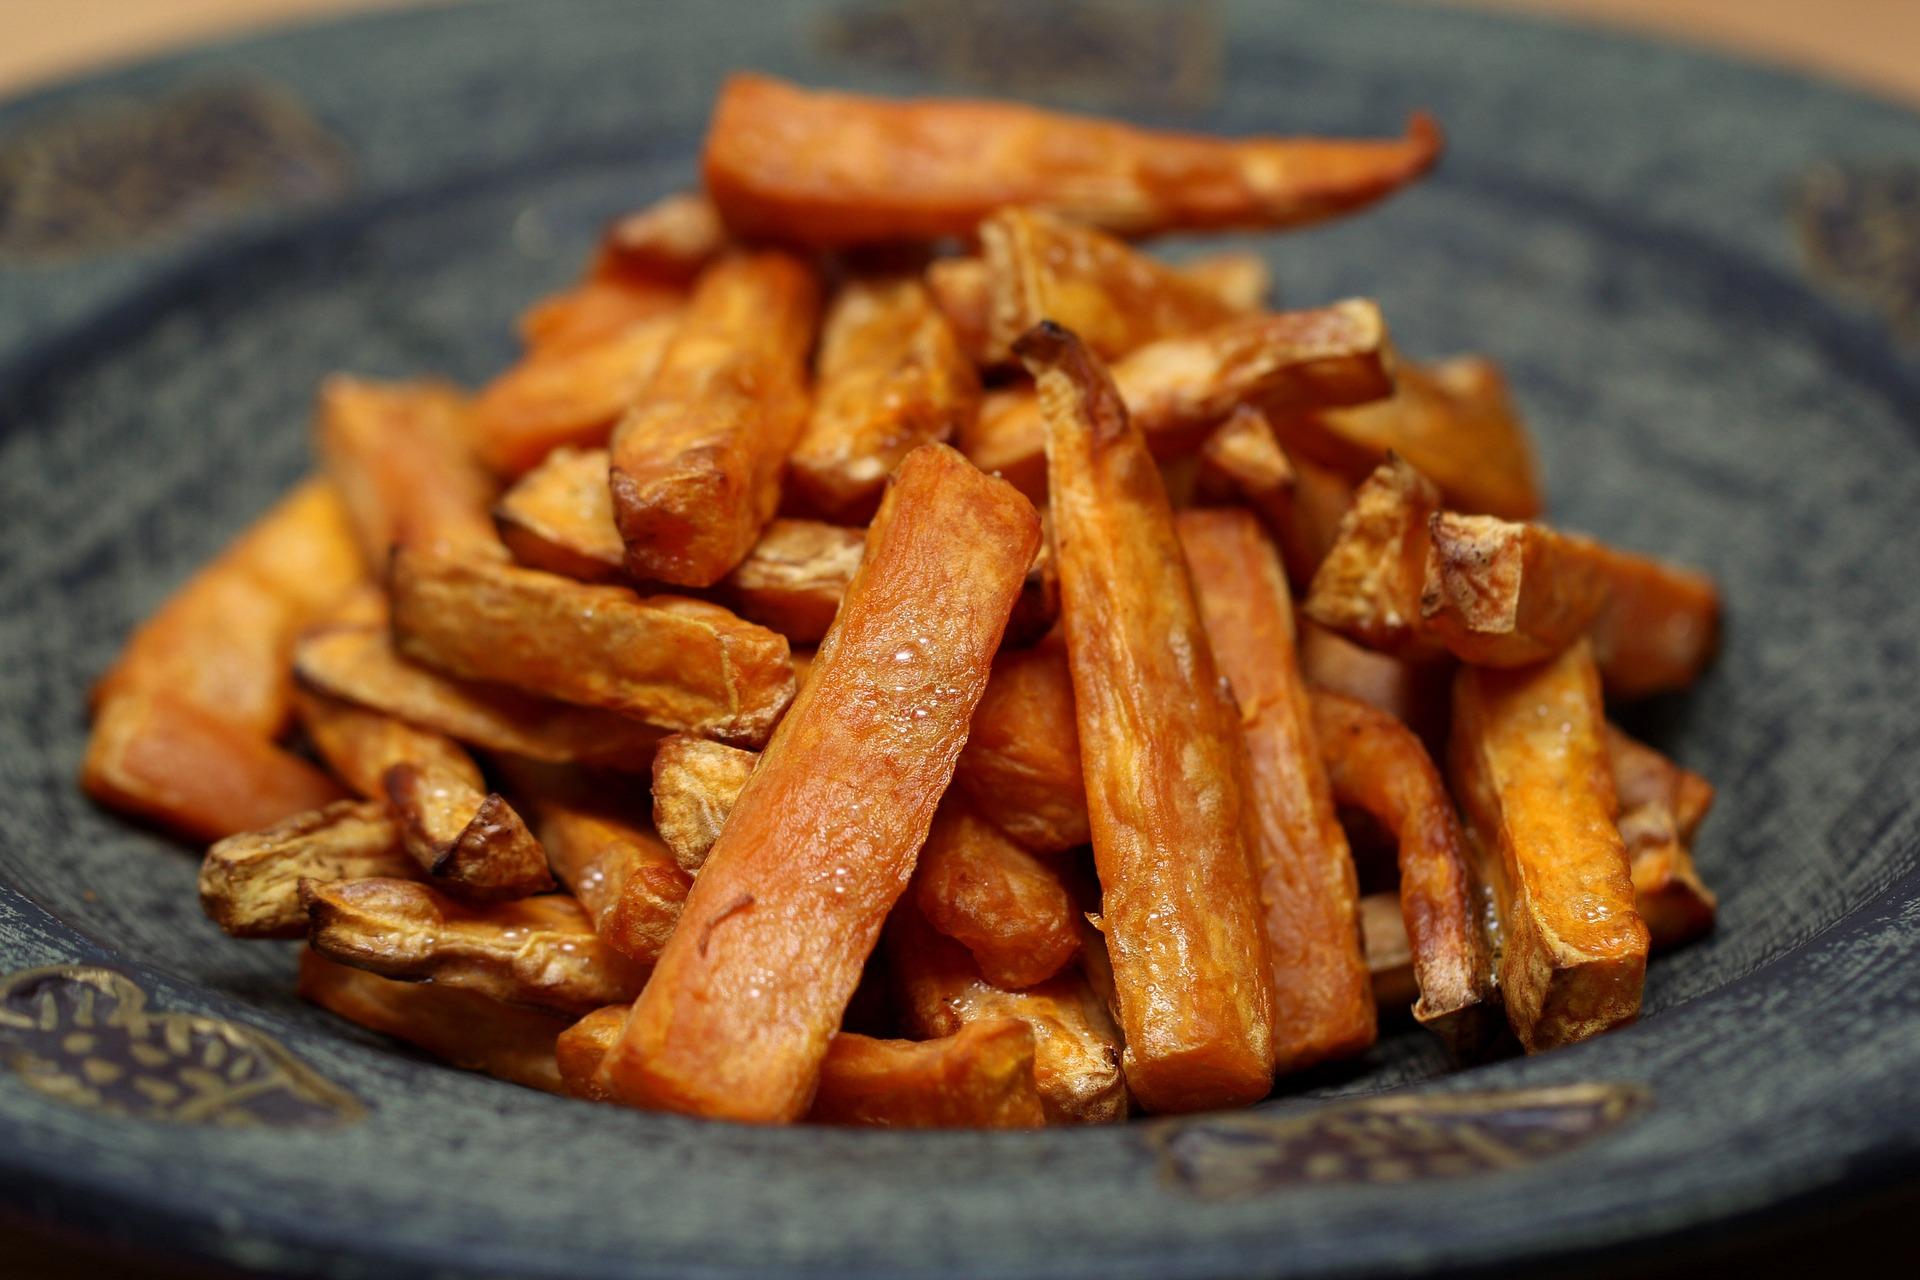 Fried potatoes - Fried plantains Bahamian cuisine, food in Bahamas, Bahamian food, traditional food in Bahamas, Bahamian dishes, vegetarian food in bahamas, vegan food in bahamas, bahamas vegetarian dishes, vegan in bahamas, vegetarian in bahamas